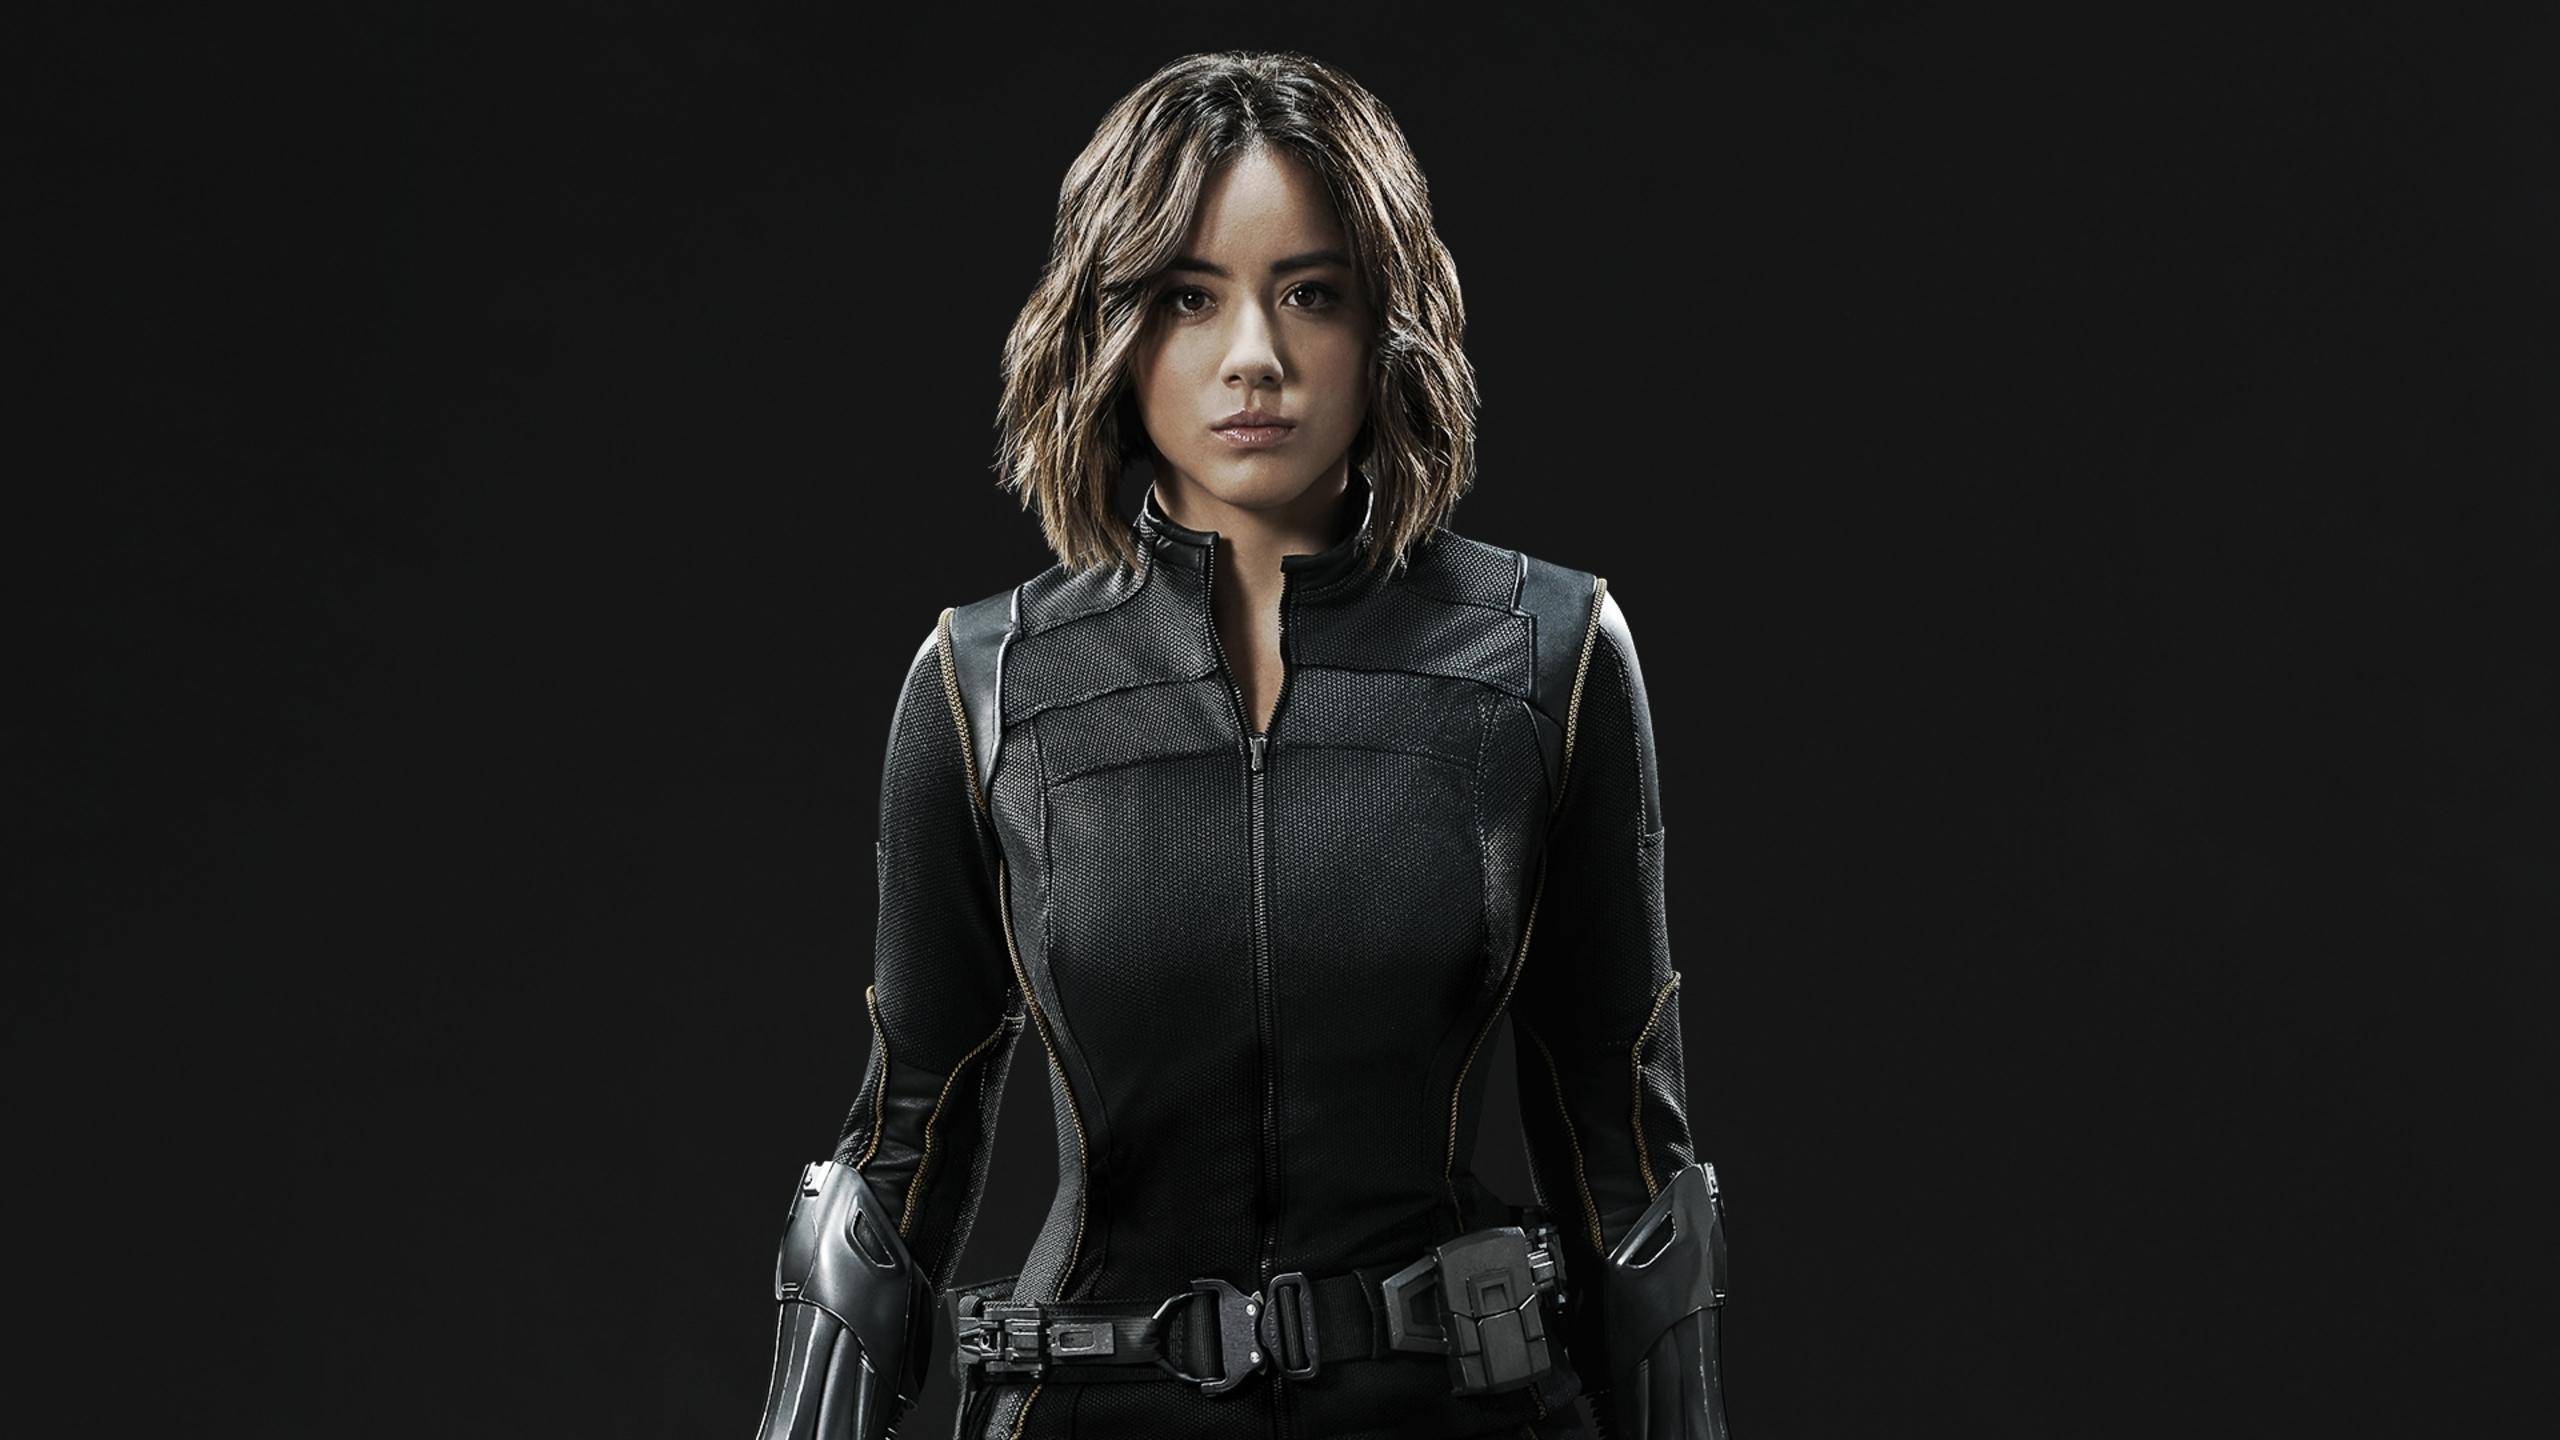 chloe-bennet-agent-of-shield-po.jpg